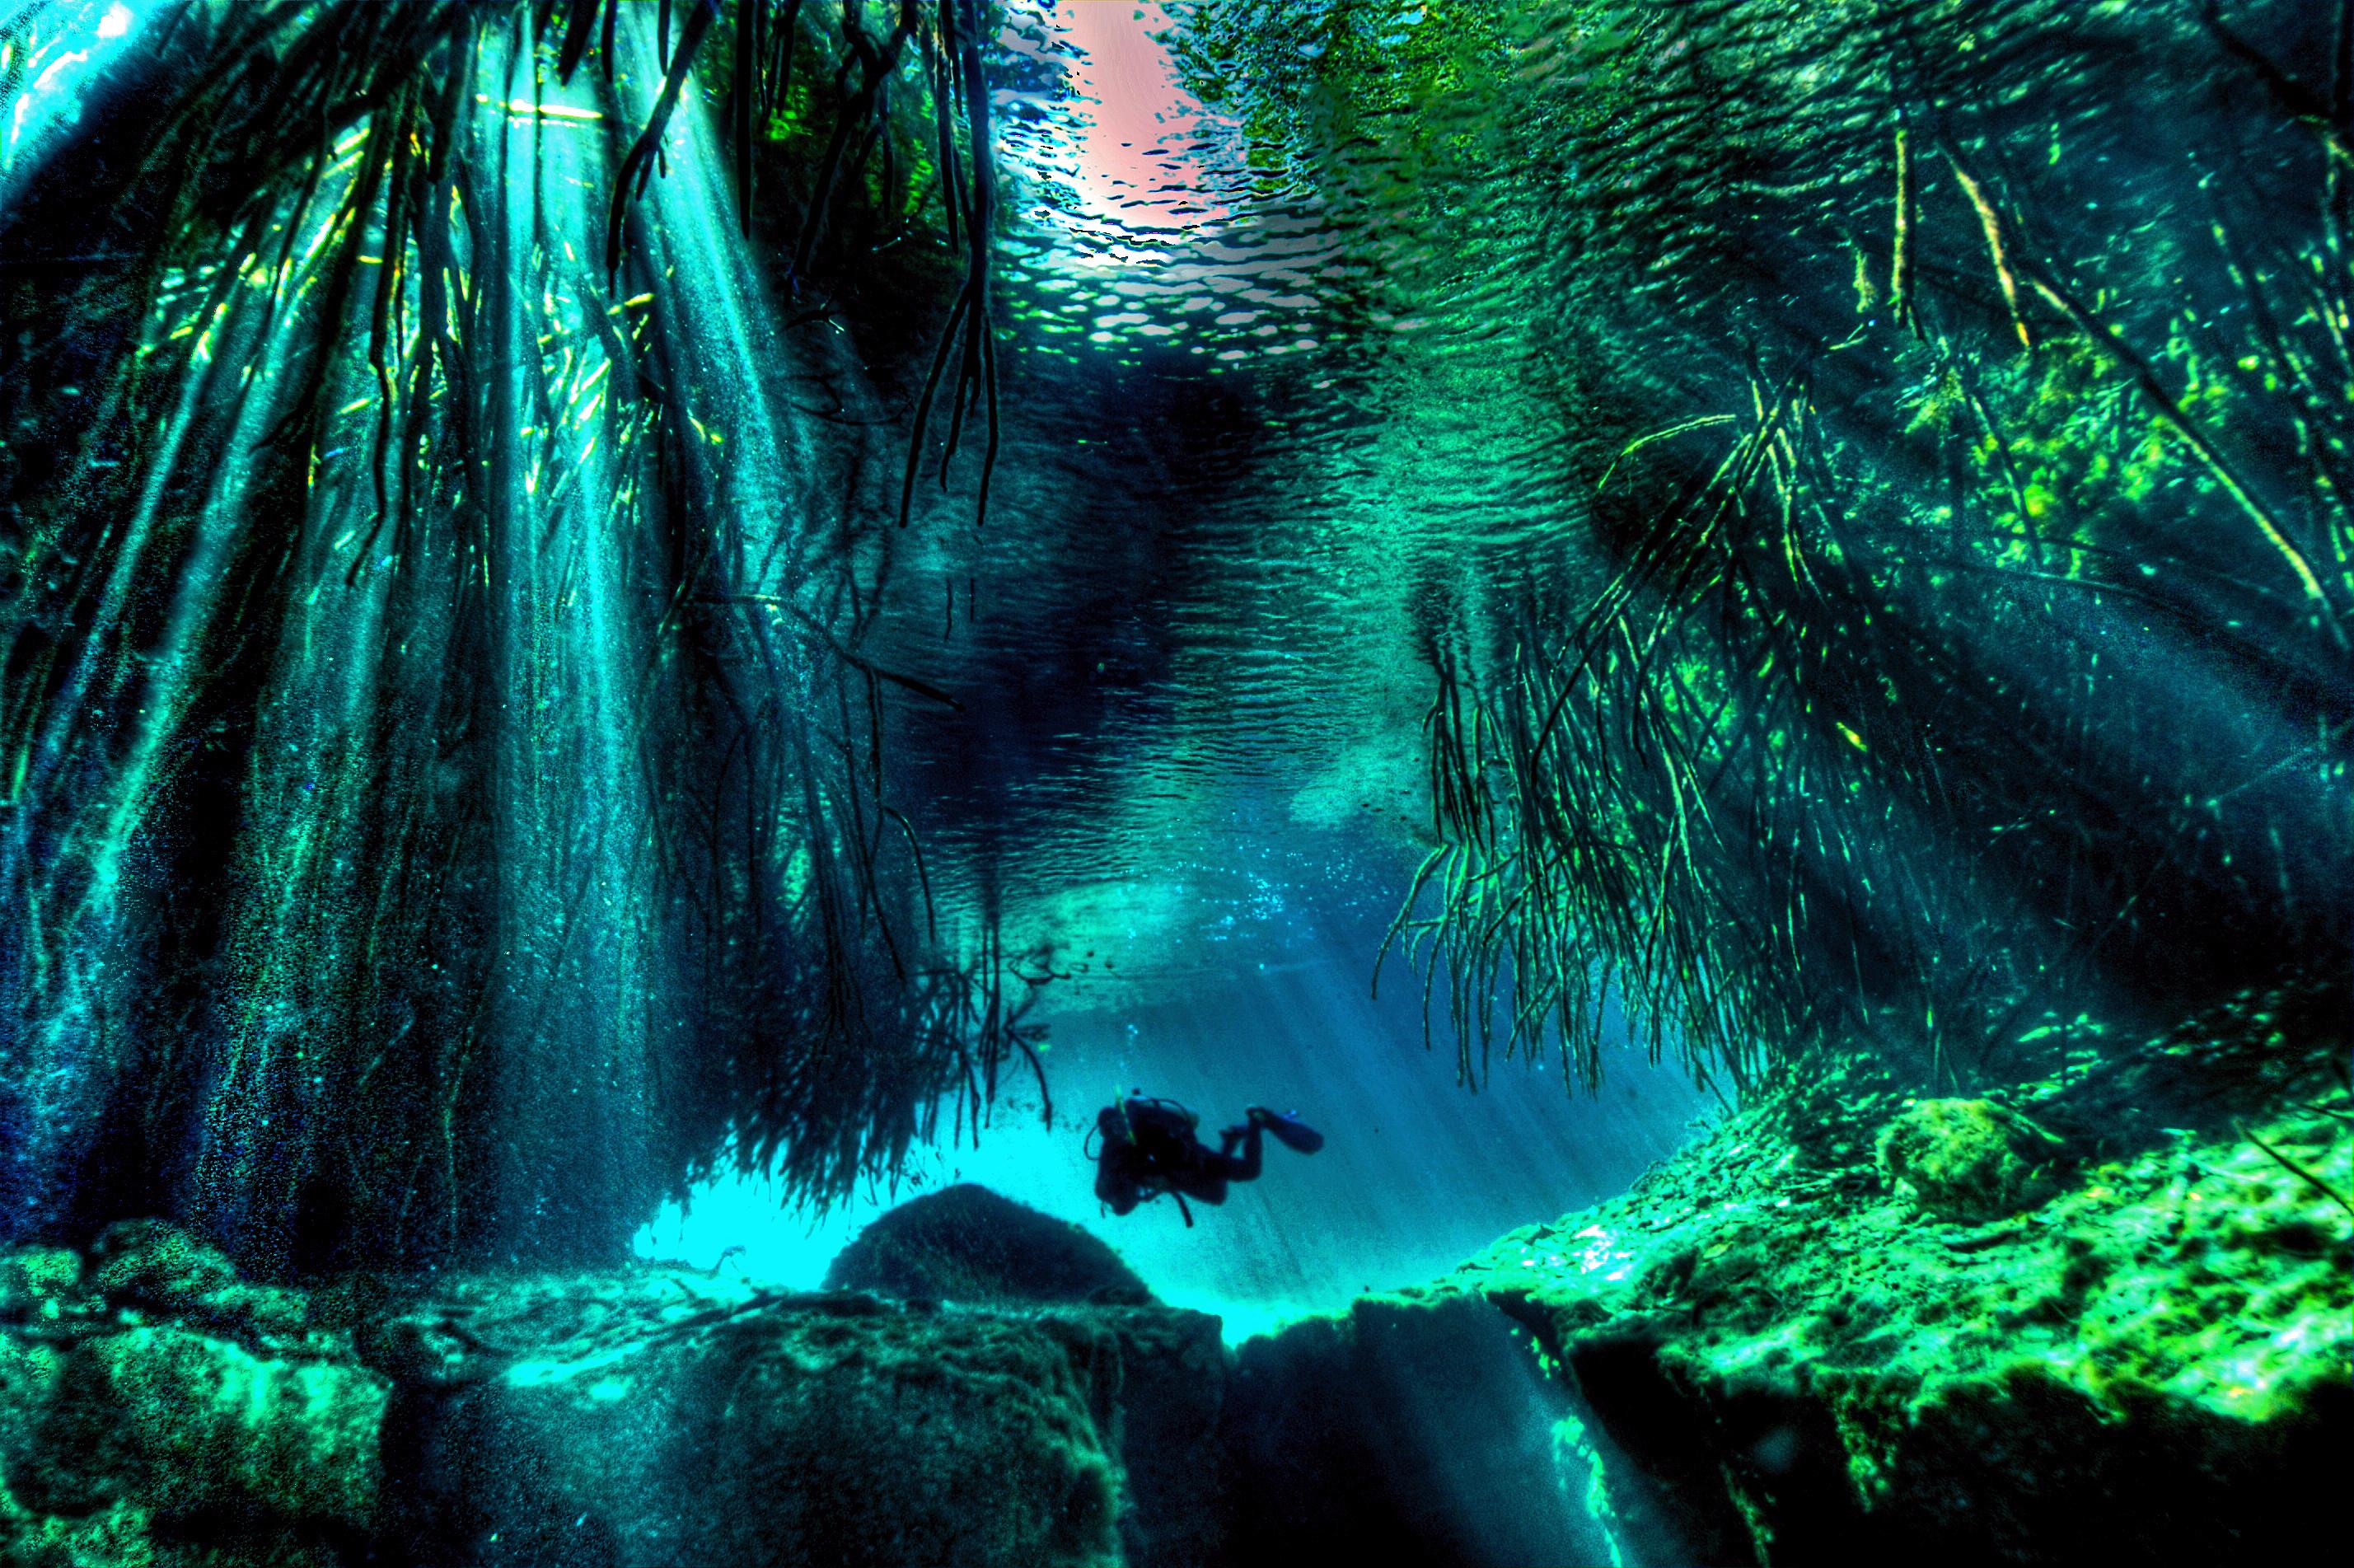 Image Credit : mexicocavediving